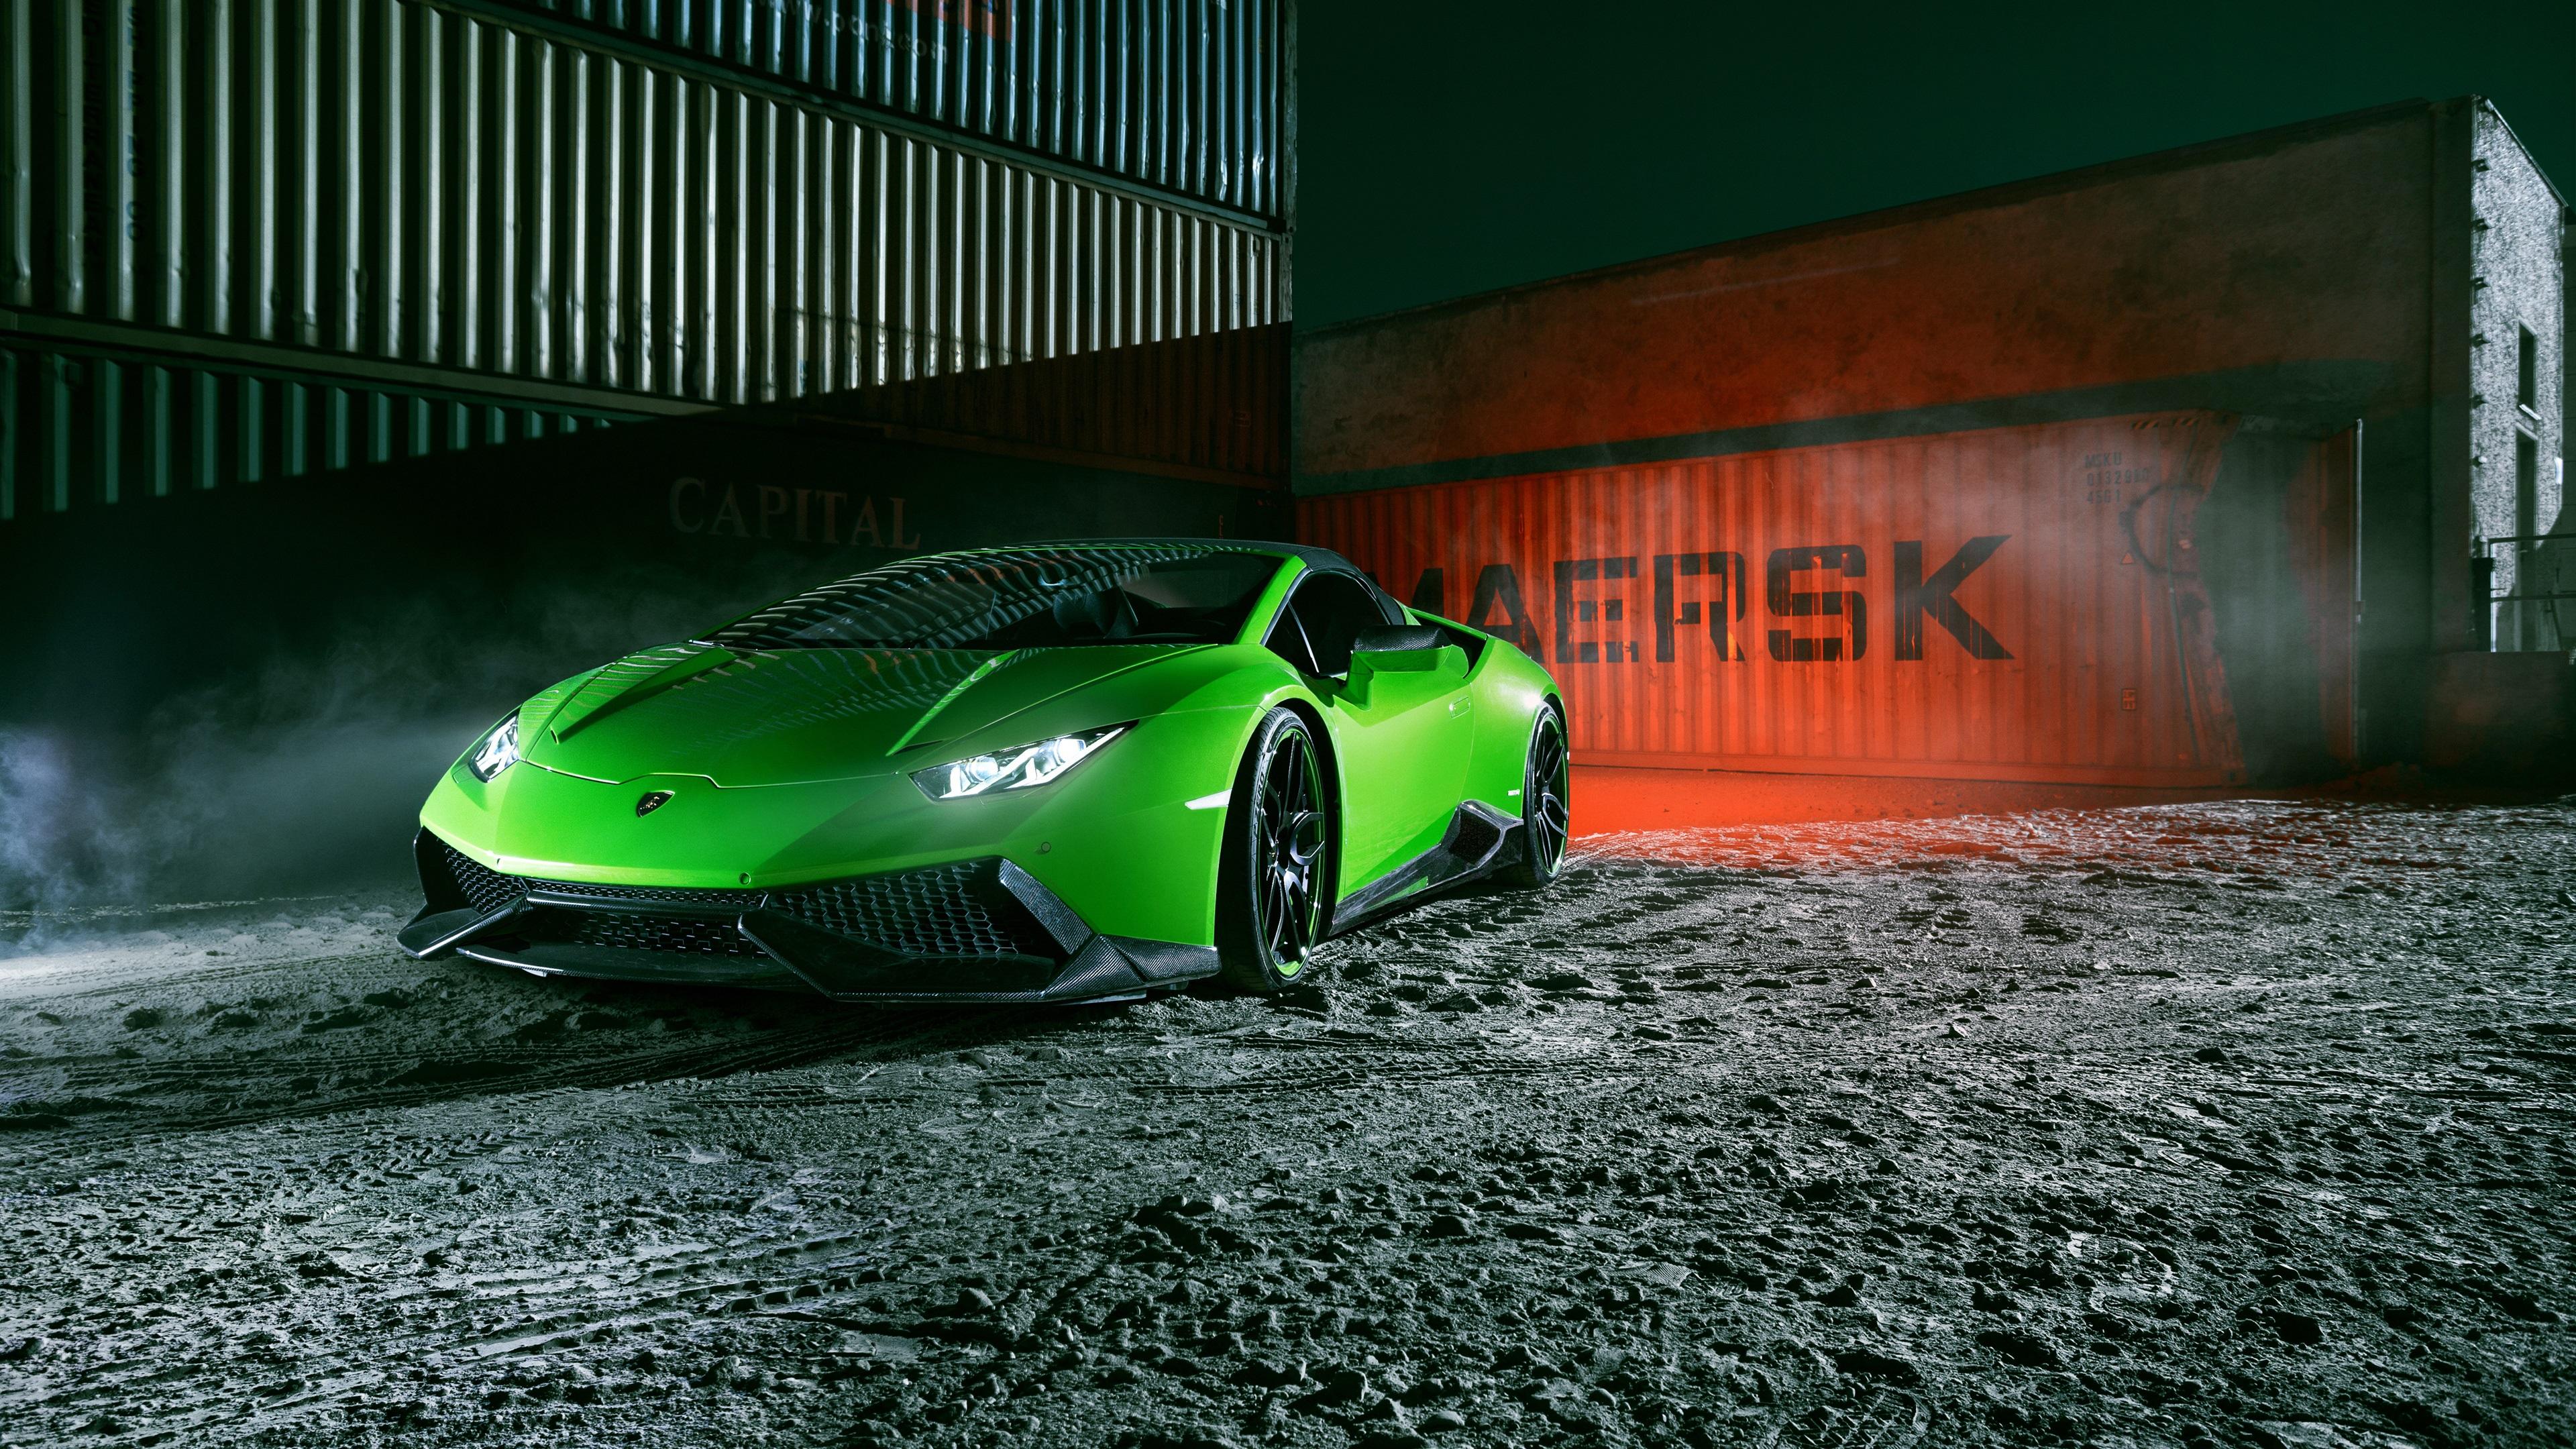 Lamborghini Huracan Spyder Green Supercar Front View Night